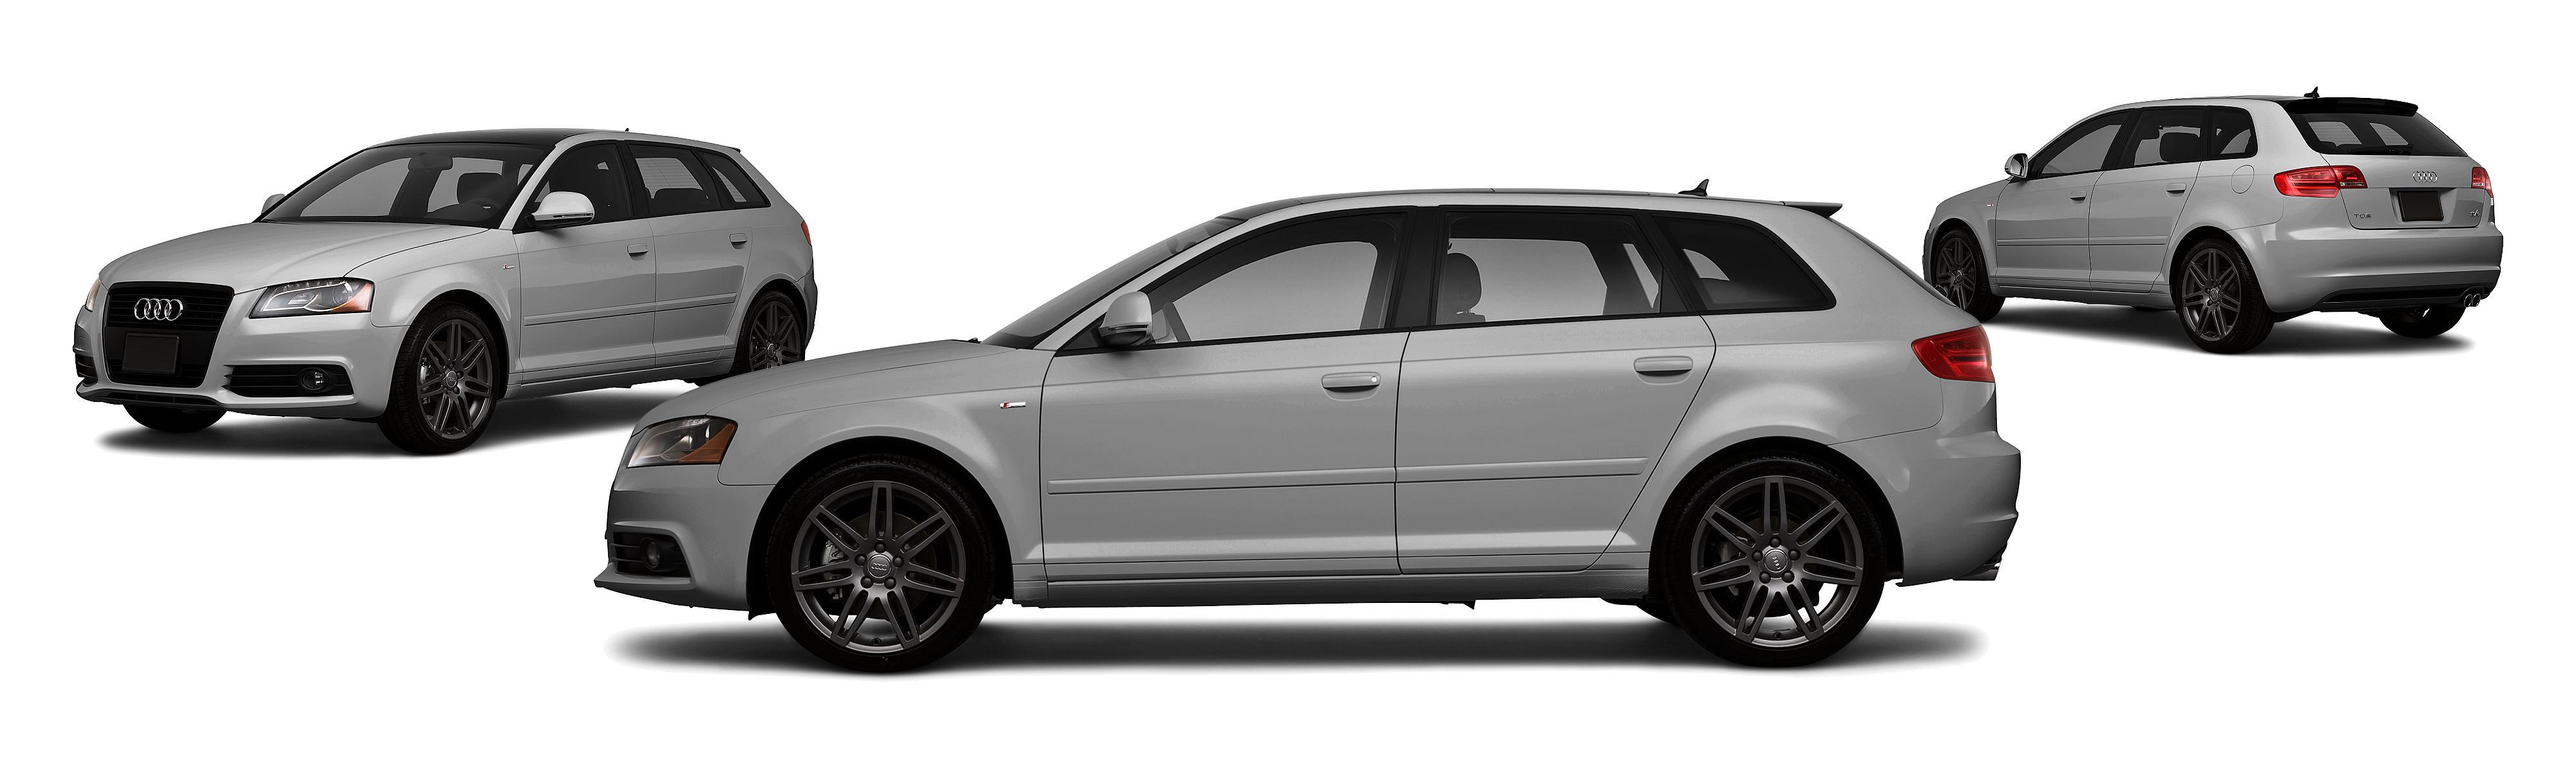 2010 Audi A3 2 0T Premium Plus 4dr Wagon 6A Research GrooveCar